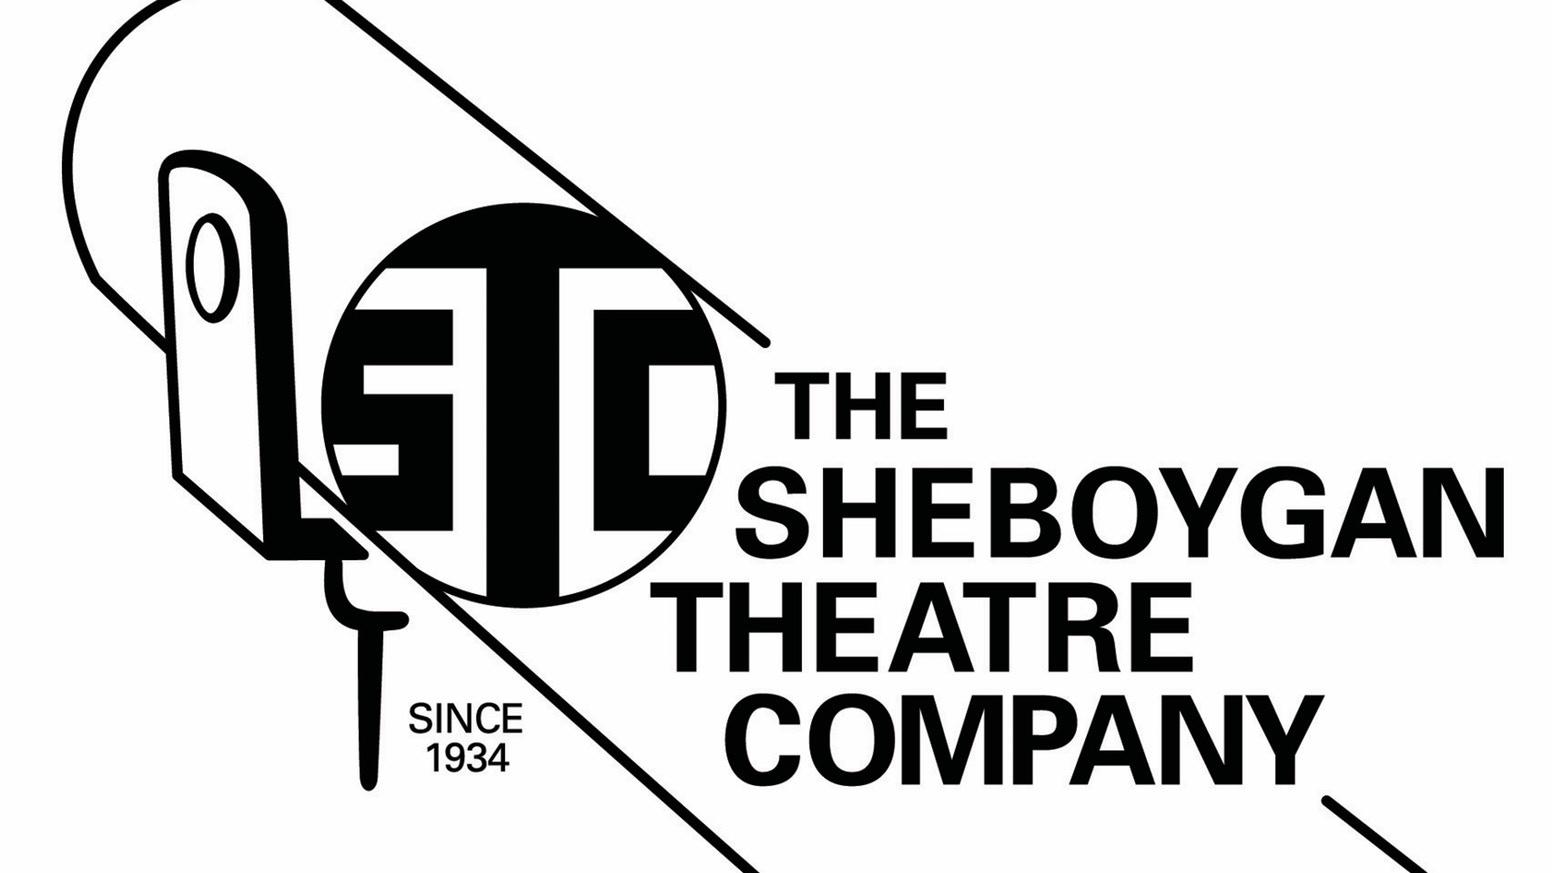 Sheboygan Theatre Company logo_1560357787492.jpg.jpg